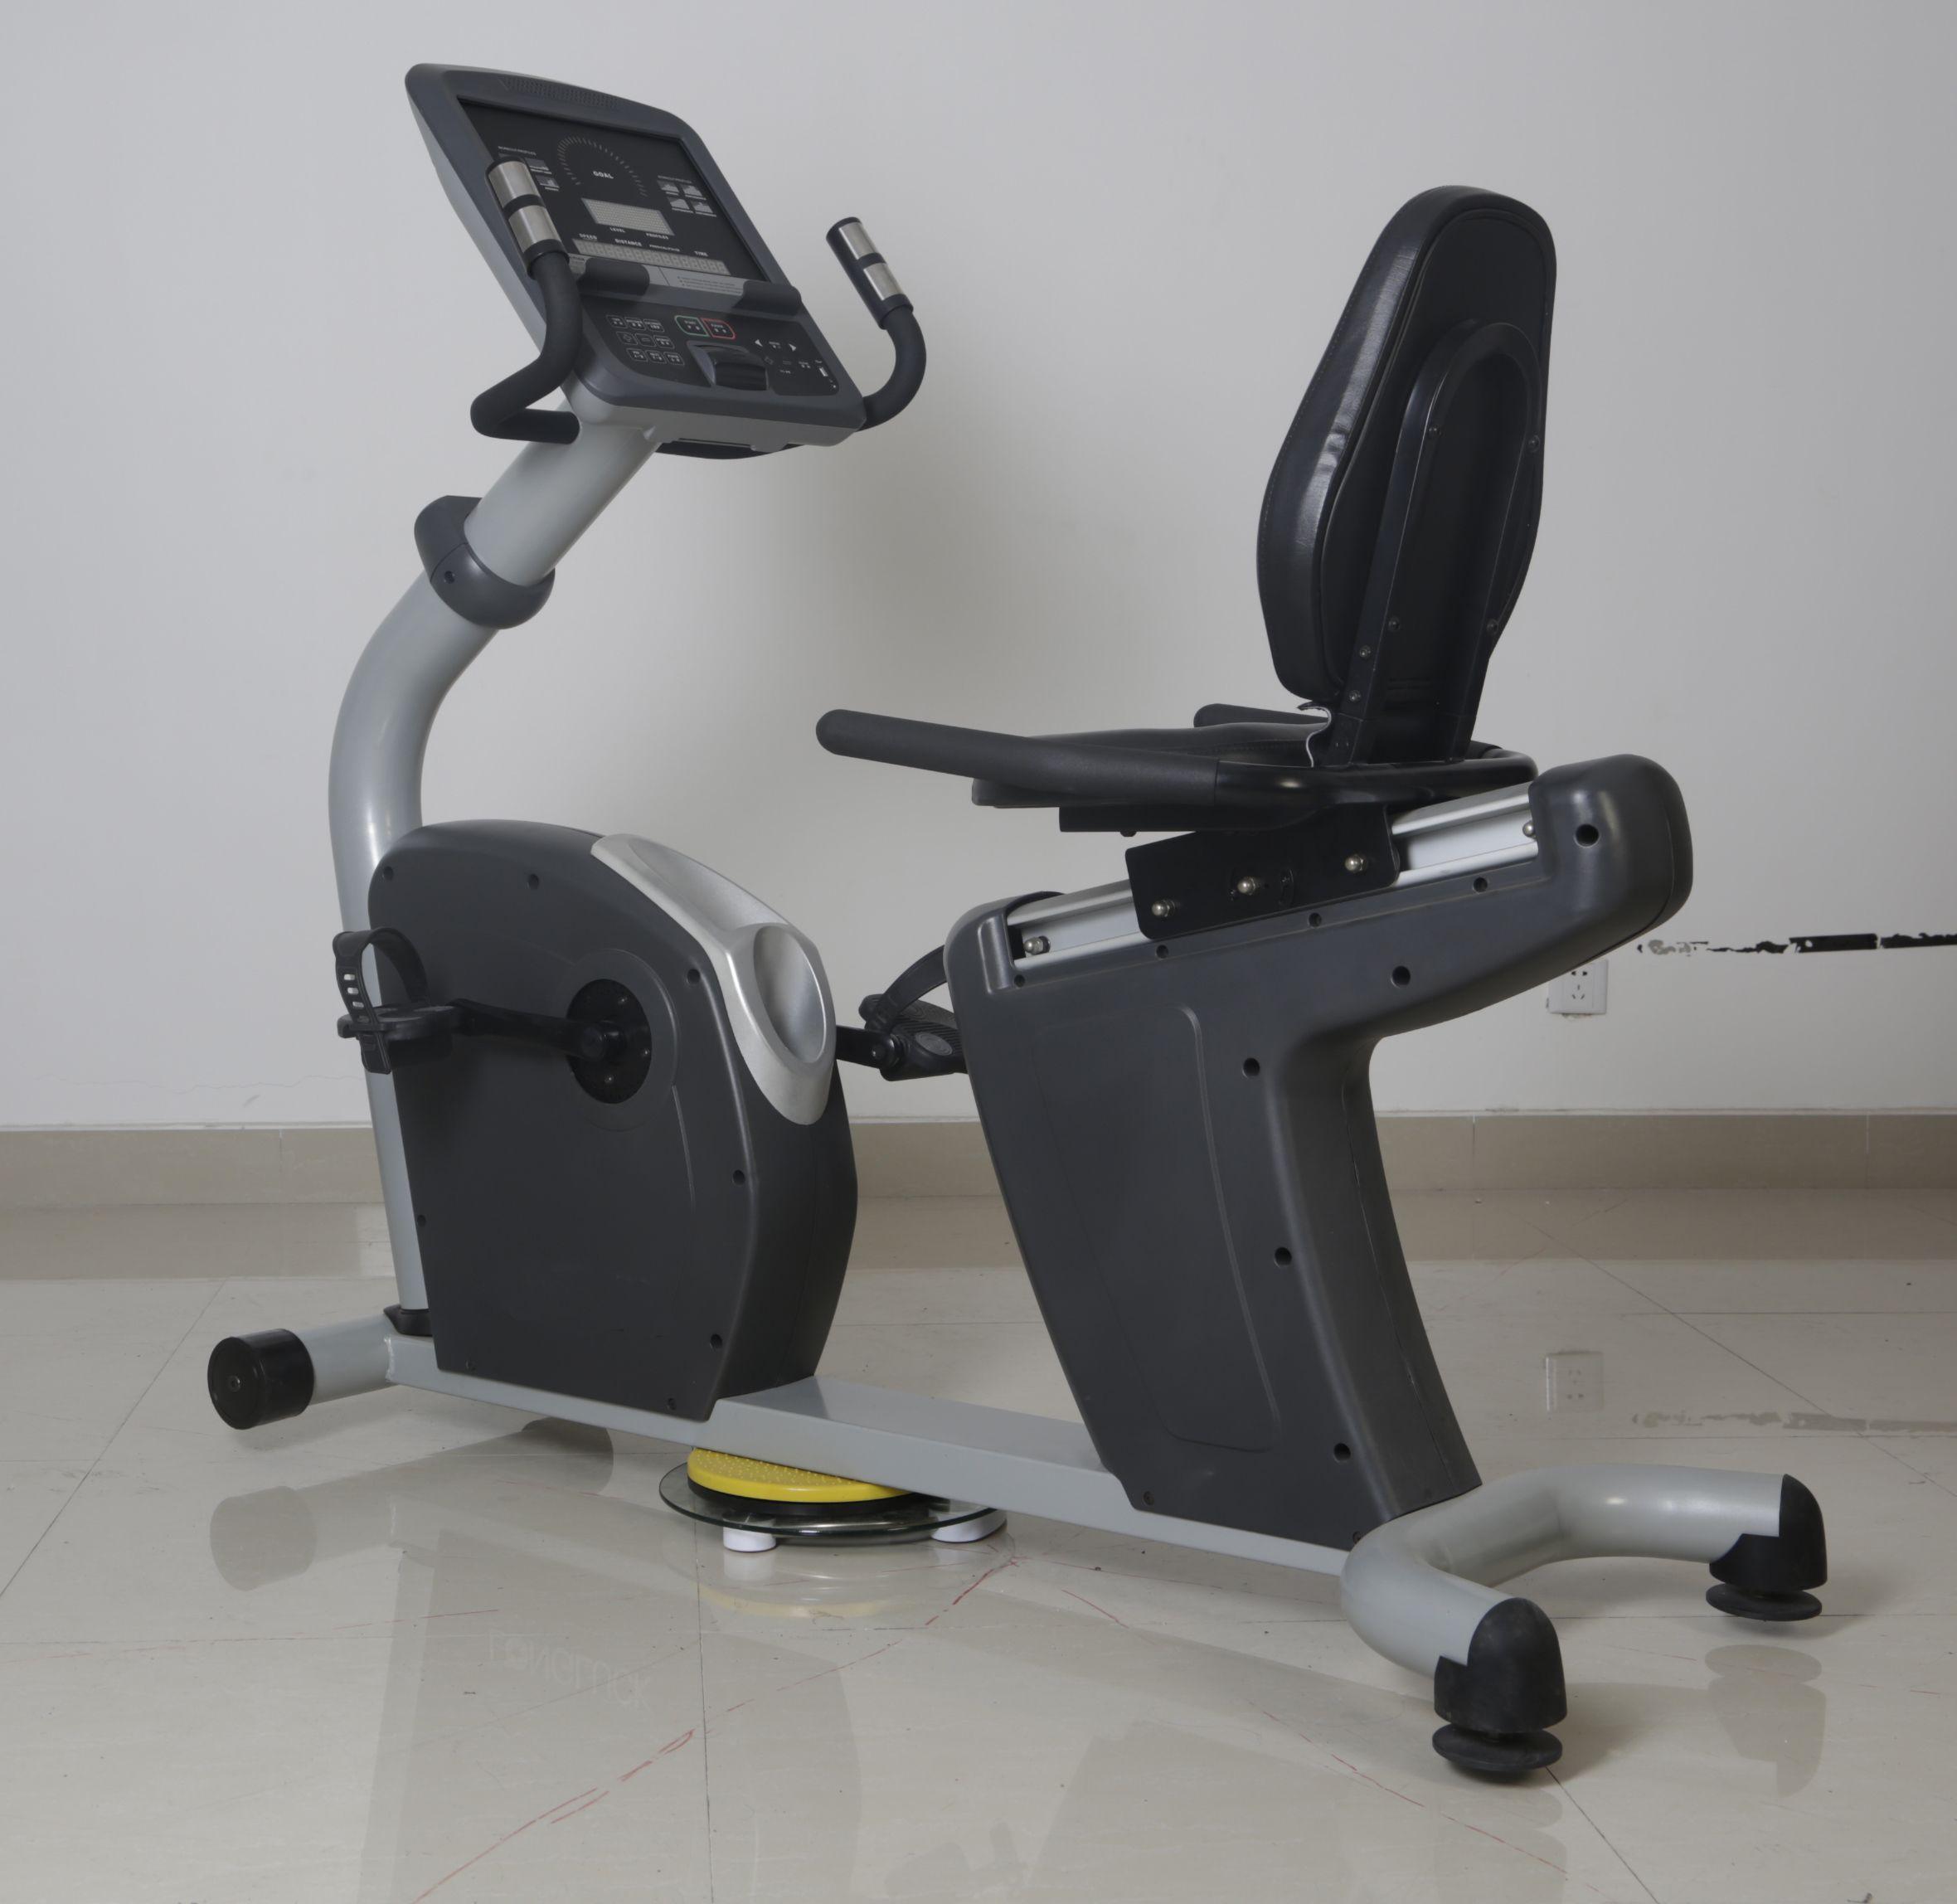 Commercial Recumbent Bike K R2 Bike Exercise Bikes Cardio Machines